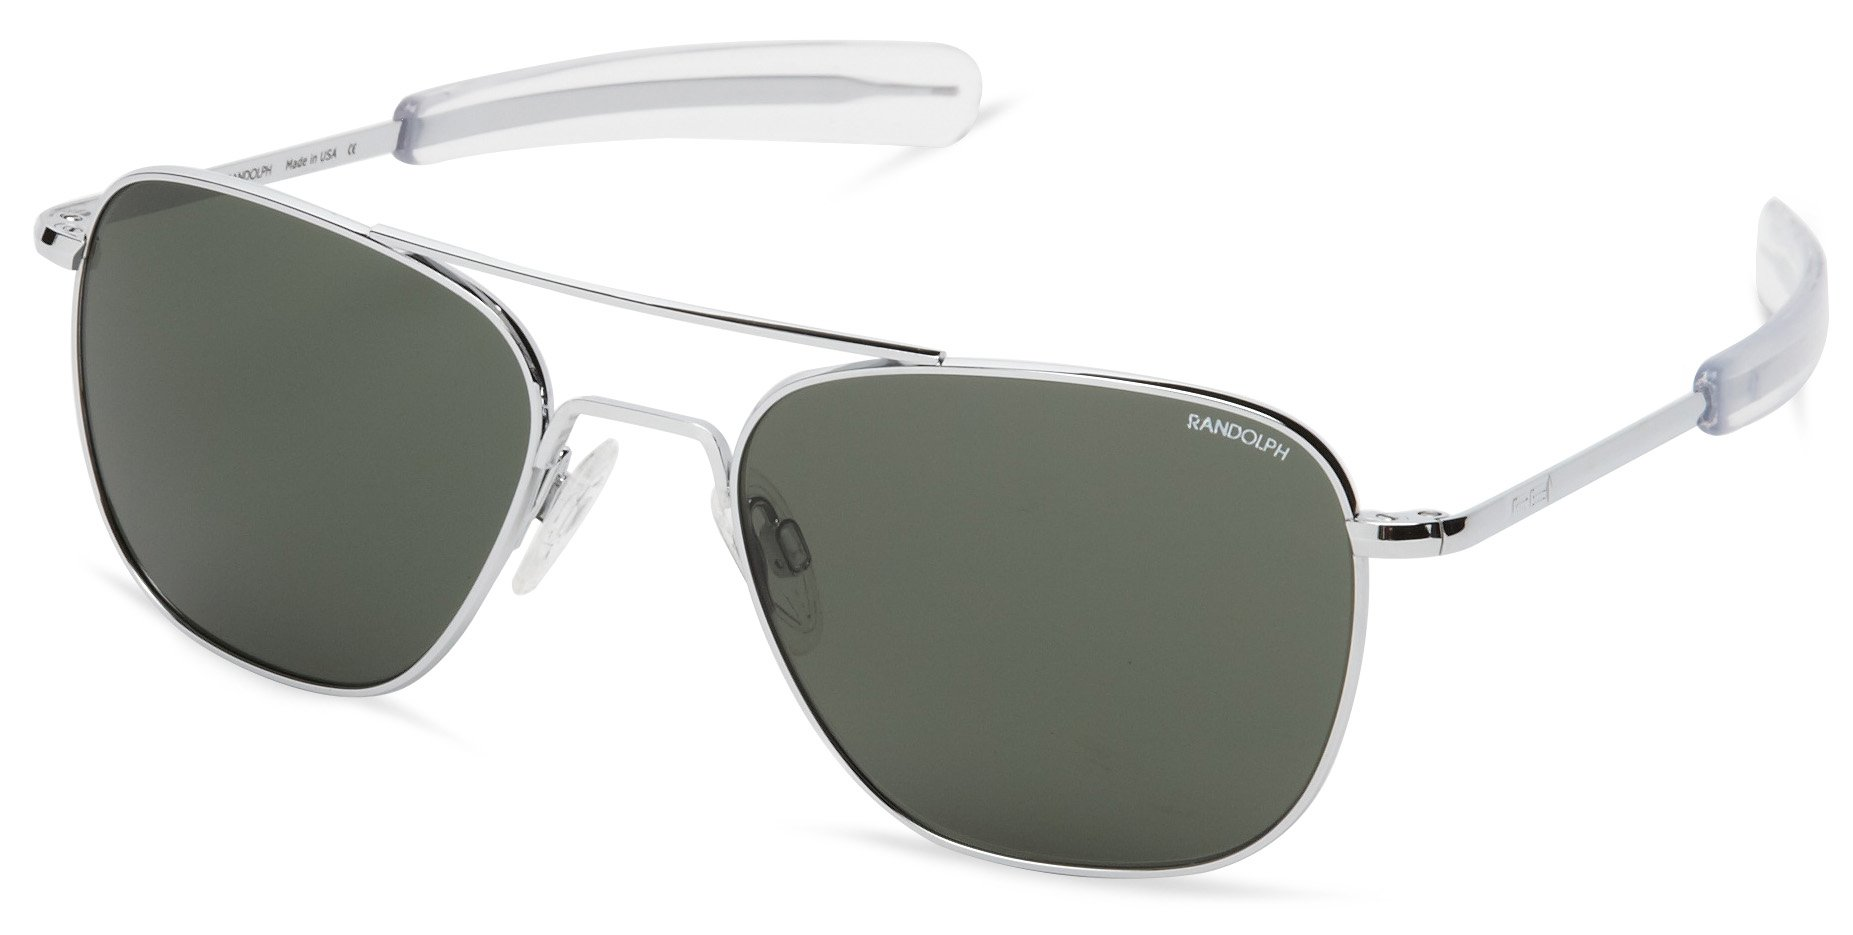 Randolph Aviator Square Sunglasses, 58, Bright Chrome, Bayonet, AGX Lenses by Randolph Engineering